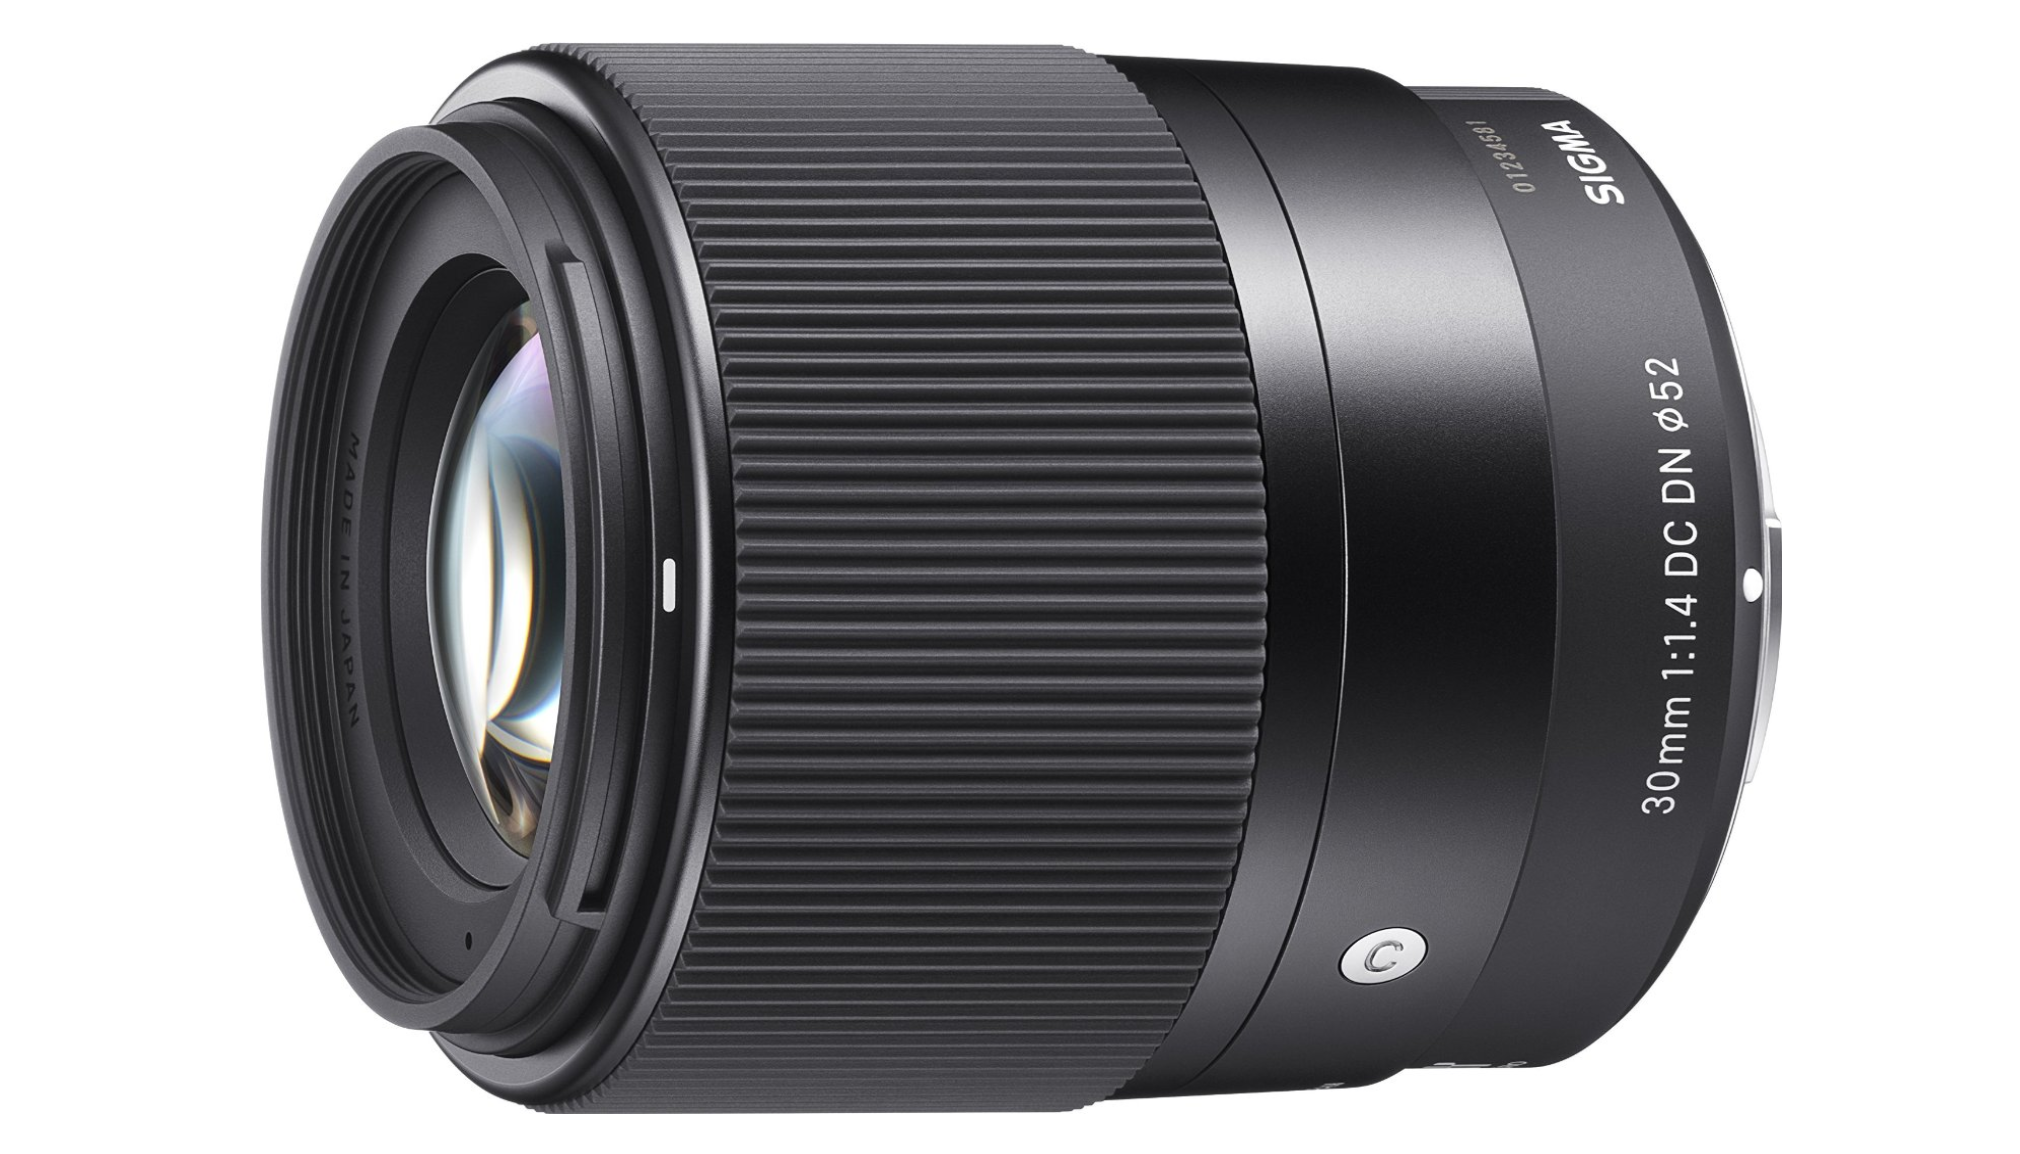 Sigma 30mm f/1.4 -